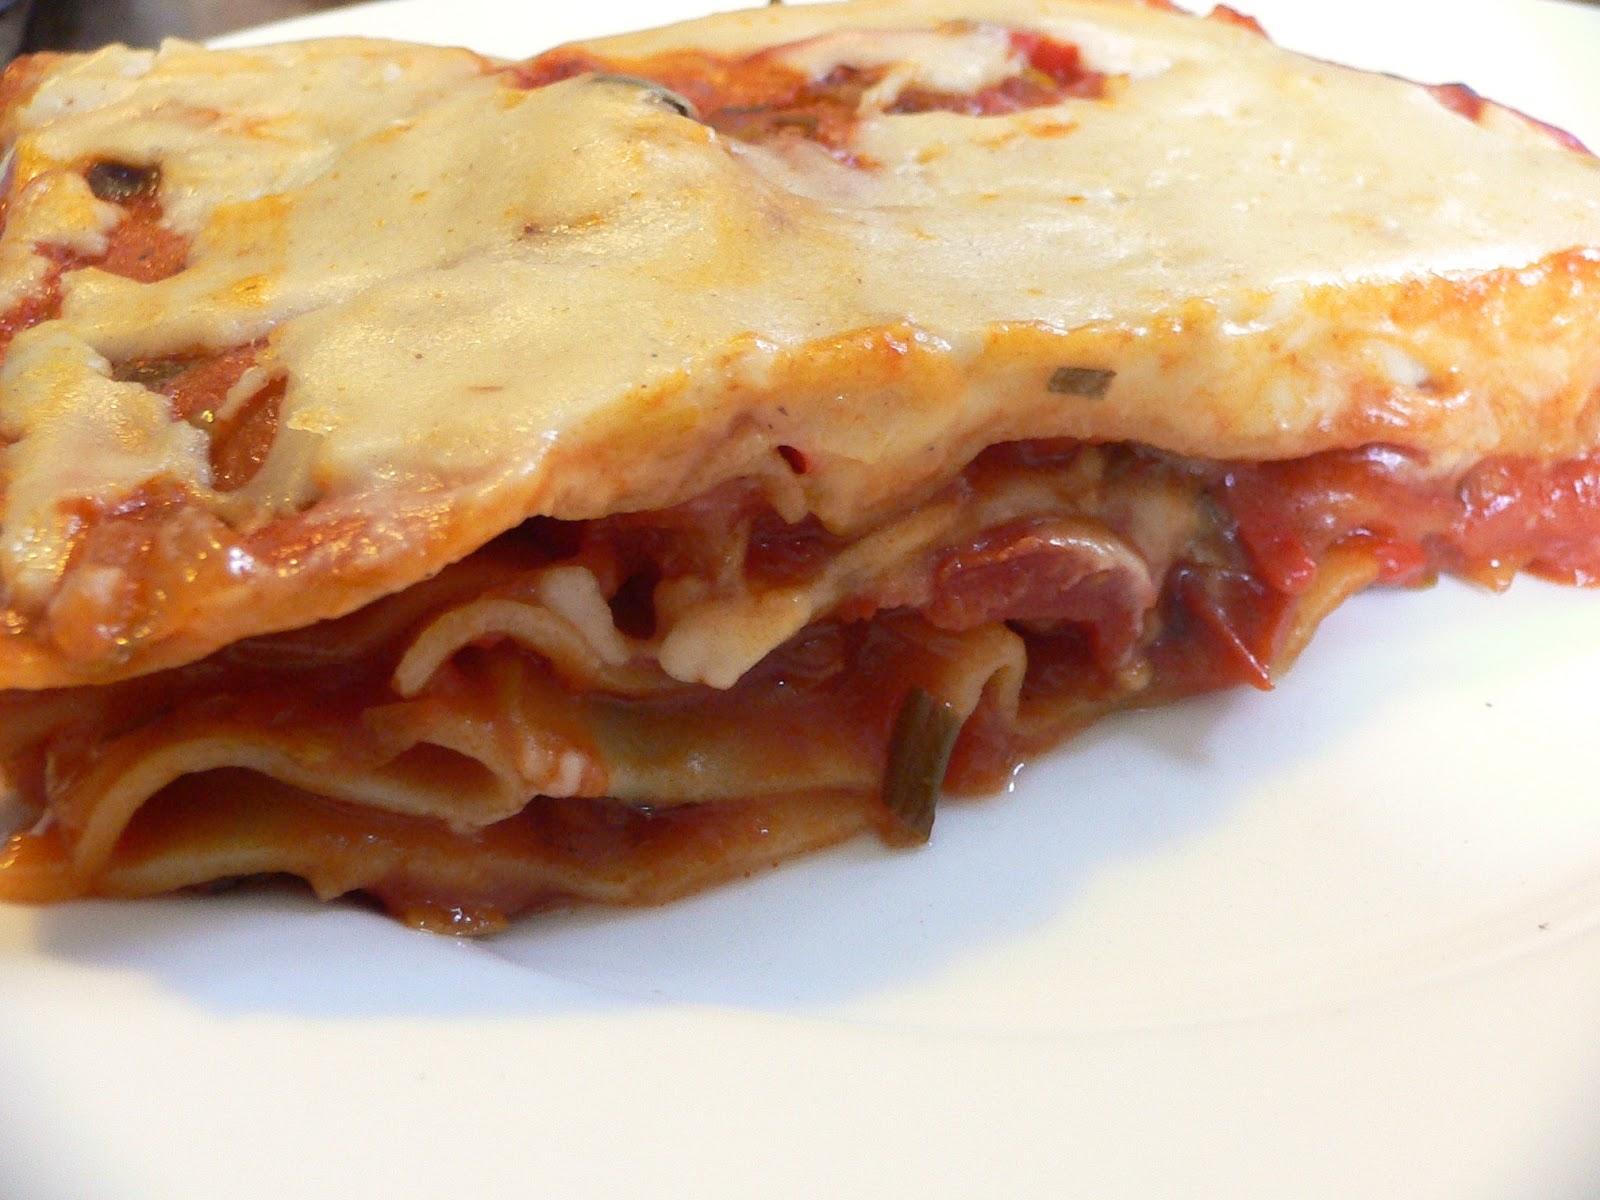 Pittige lasagne met salami en paprika